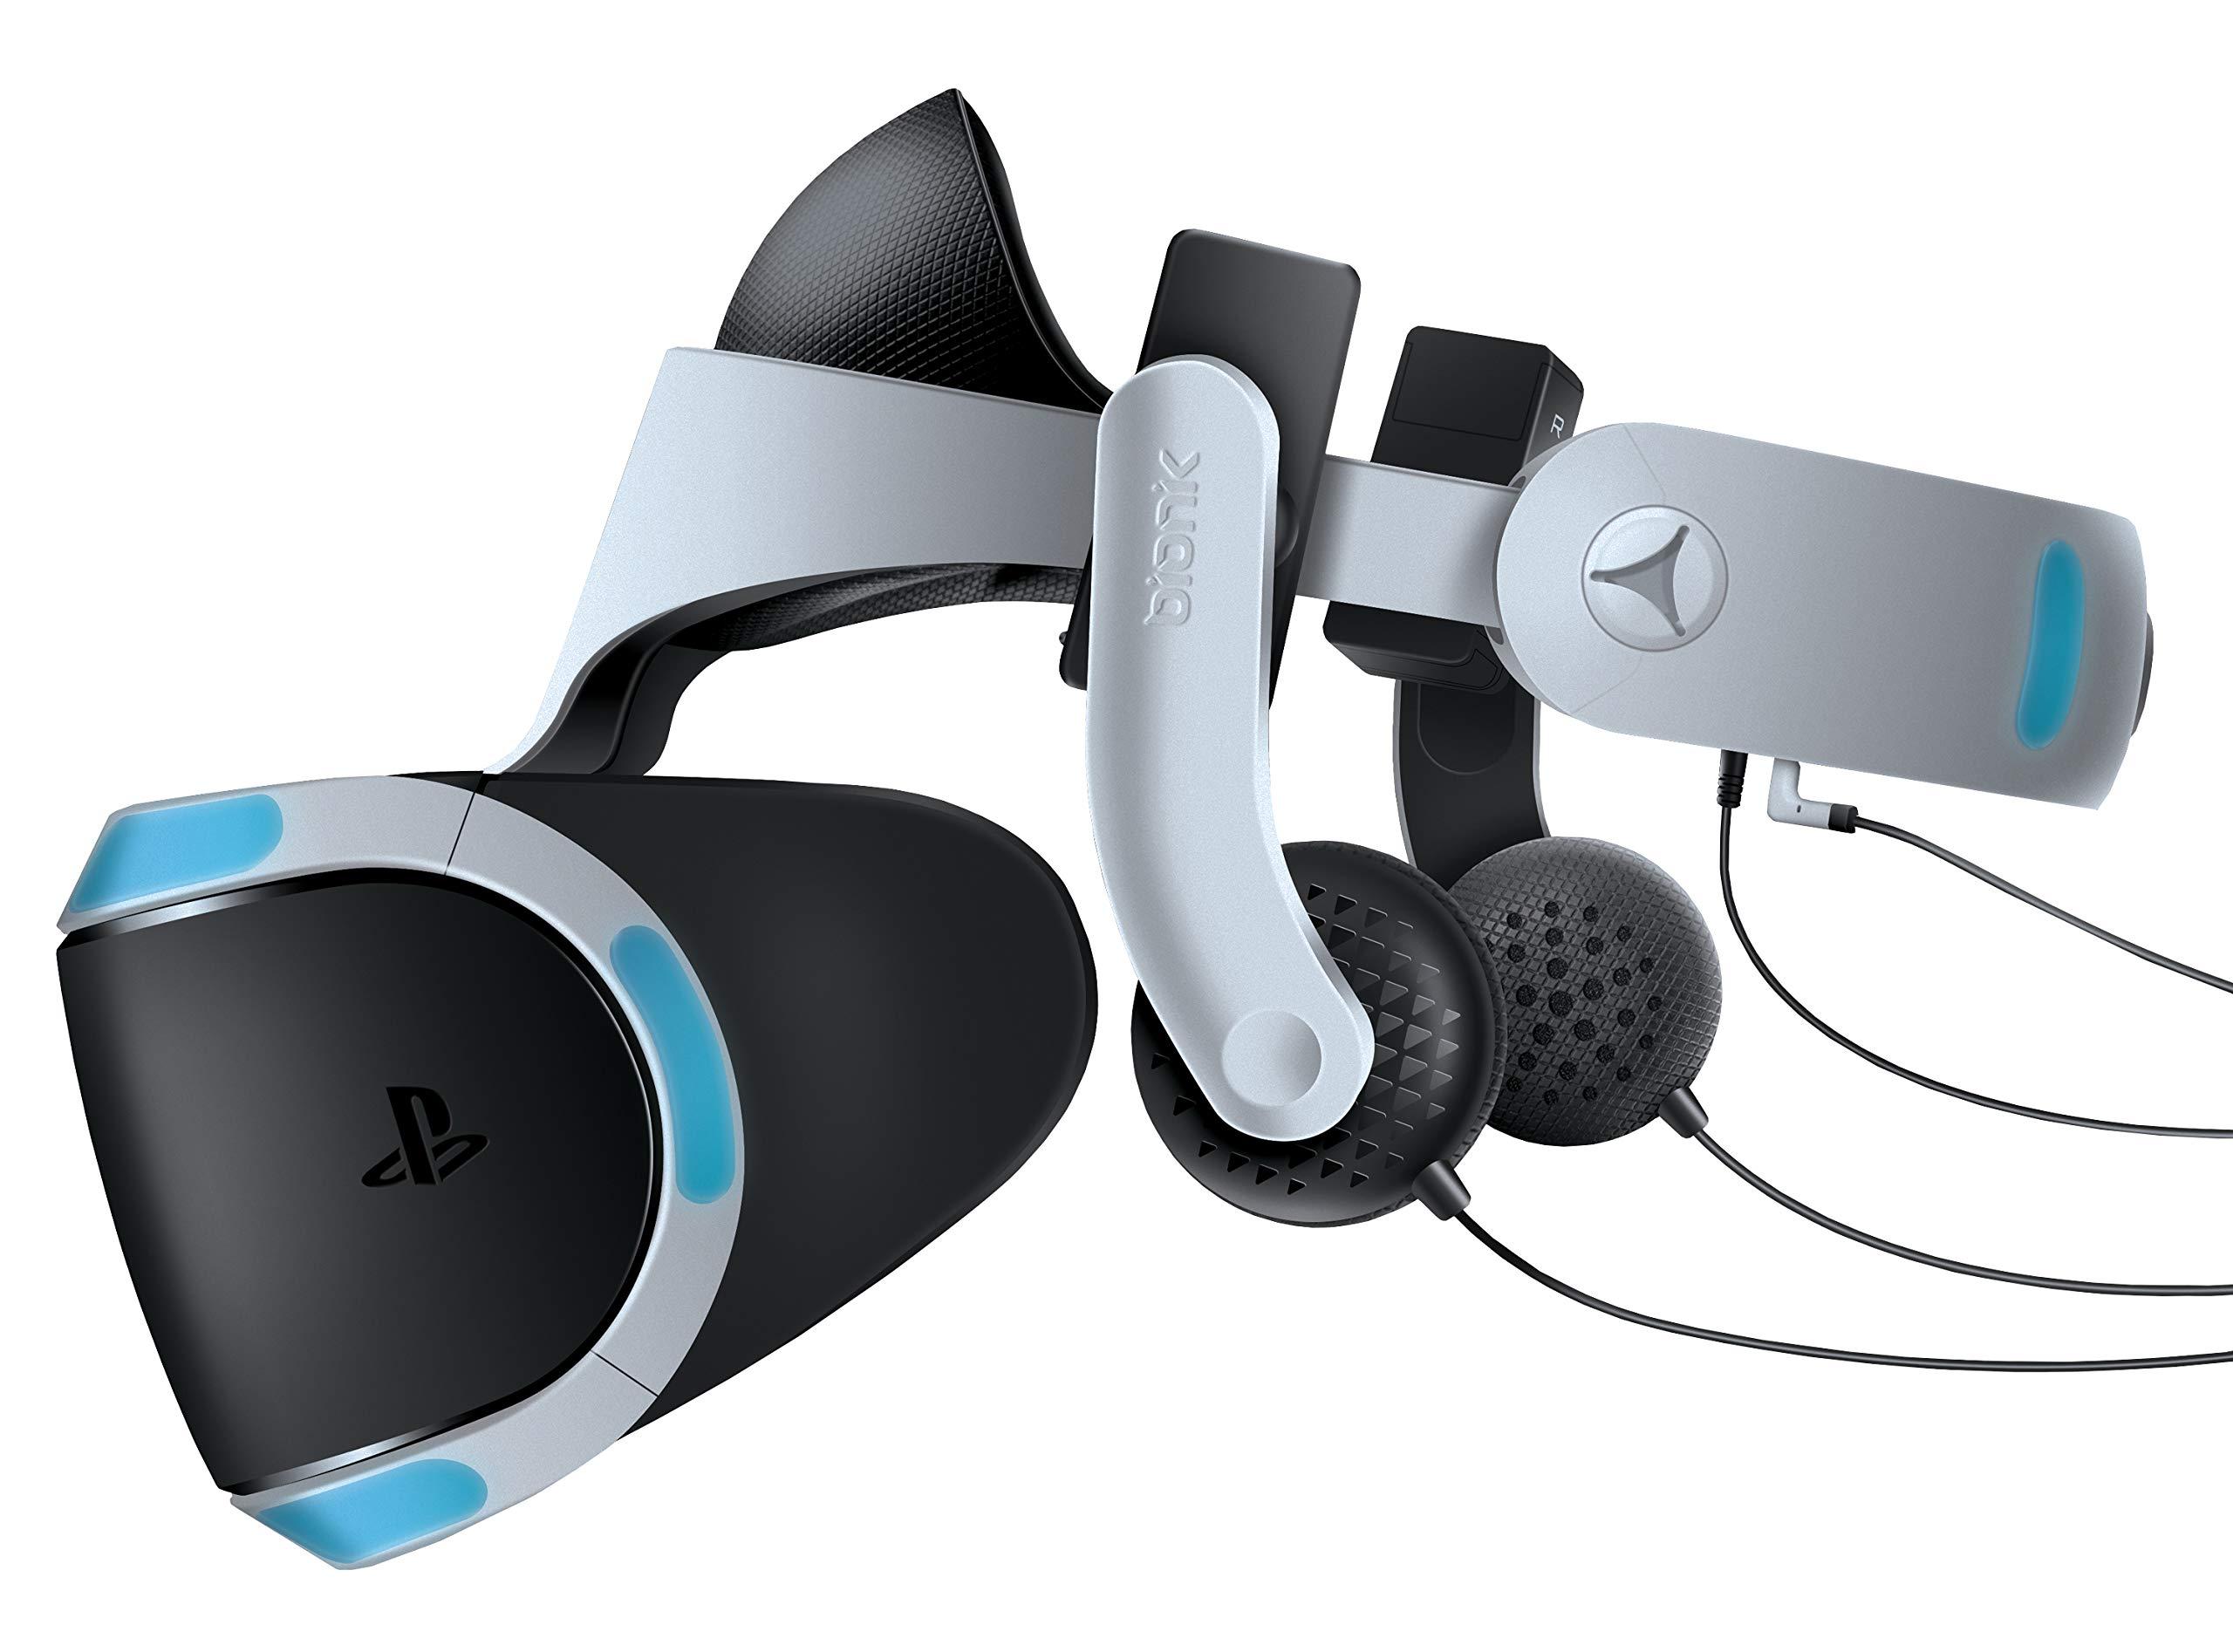 Bionik Mantis VR Headphones - High Fidelity Headset For PSVR (PS4) by Bionik